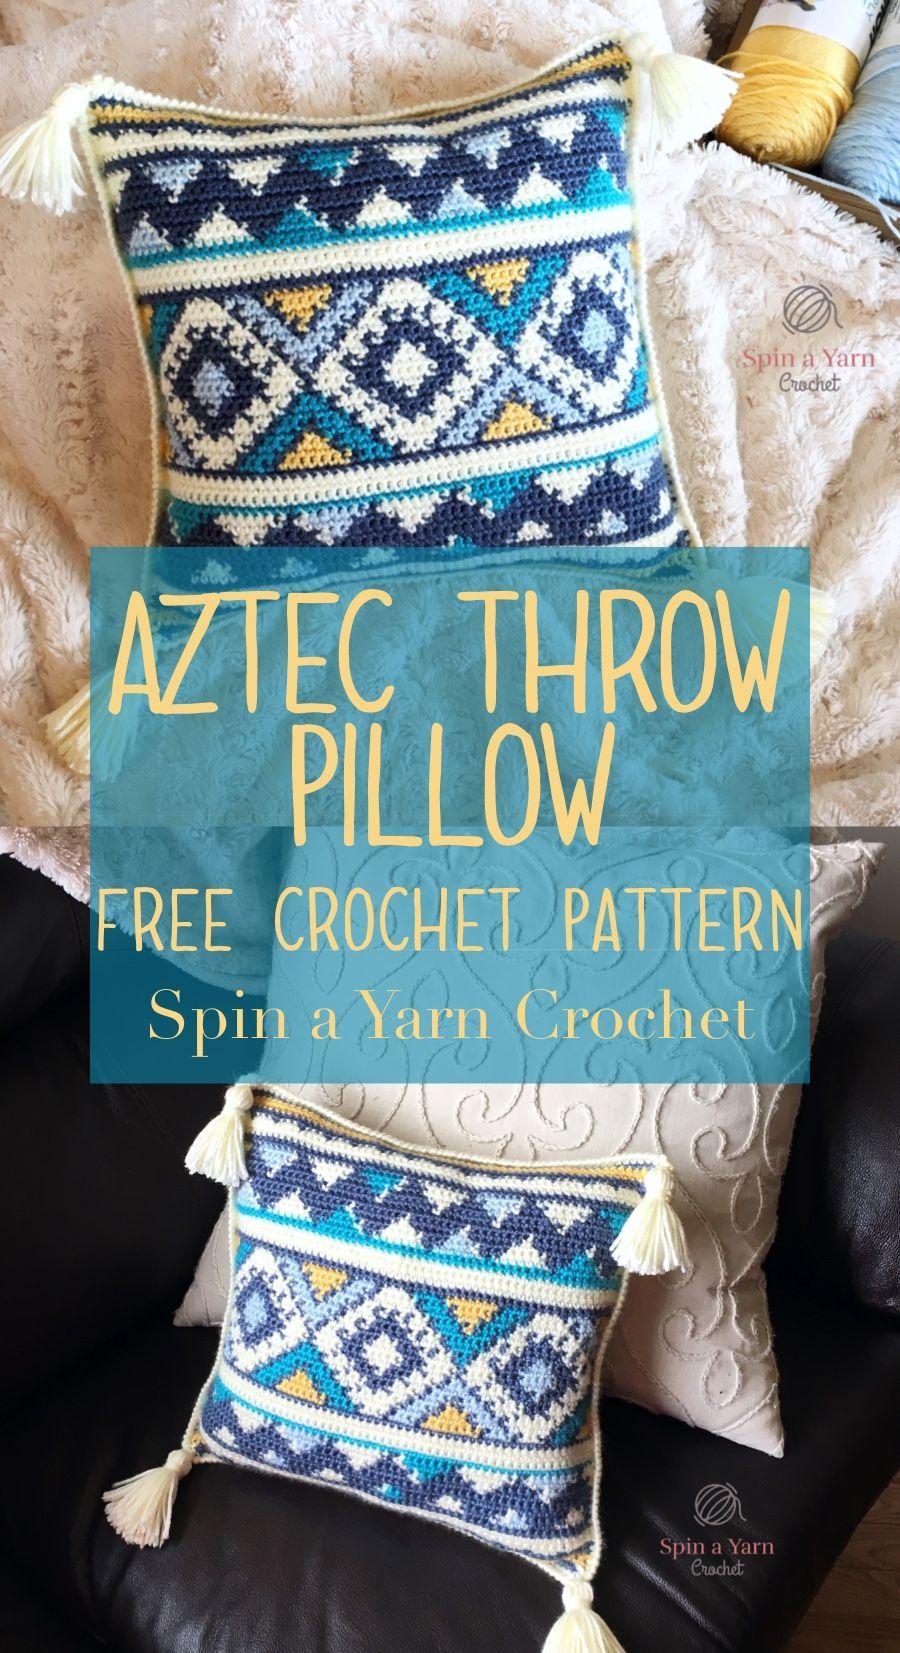 Aztec Throw Pillow Free Crochet Pattern